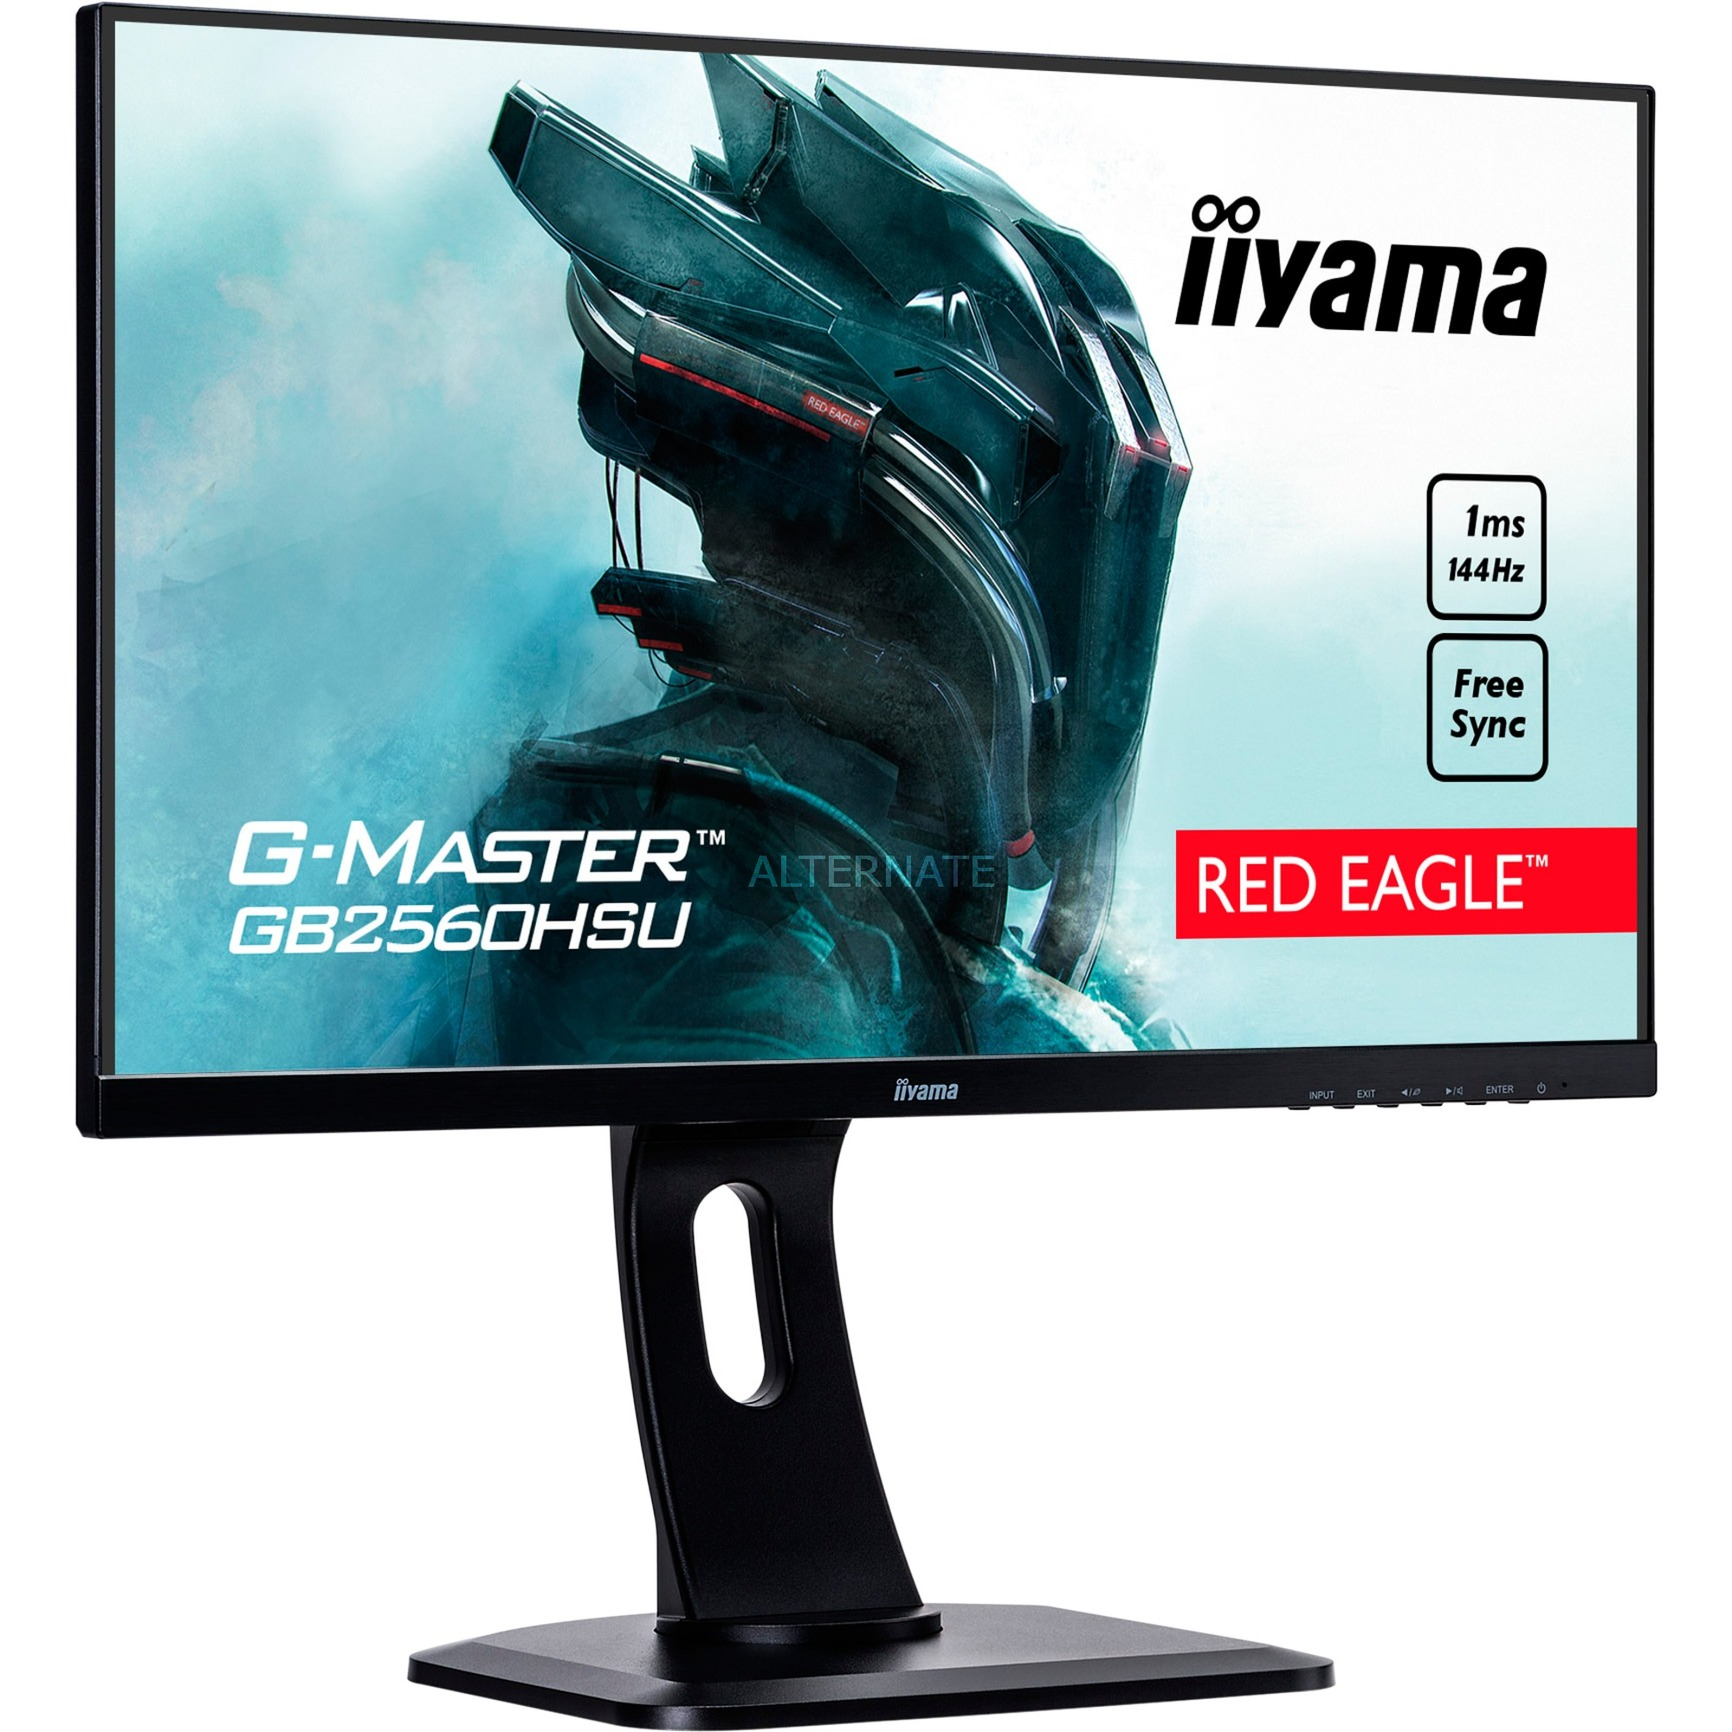 "G-MASTER GB2560HSU-B1 LED display 62,2 cm (24.5"") Full HD Plana Mate Negro, Monitor LED"